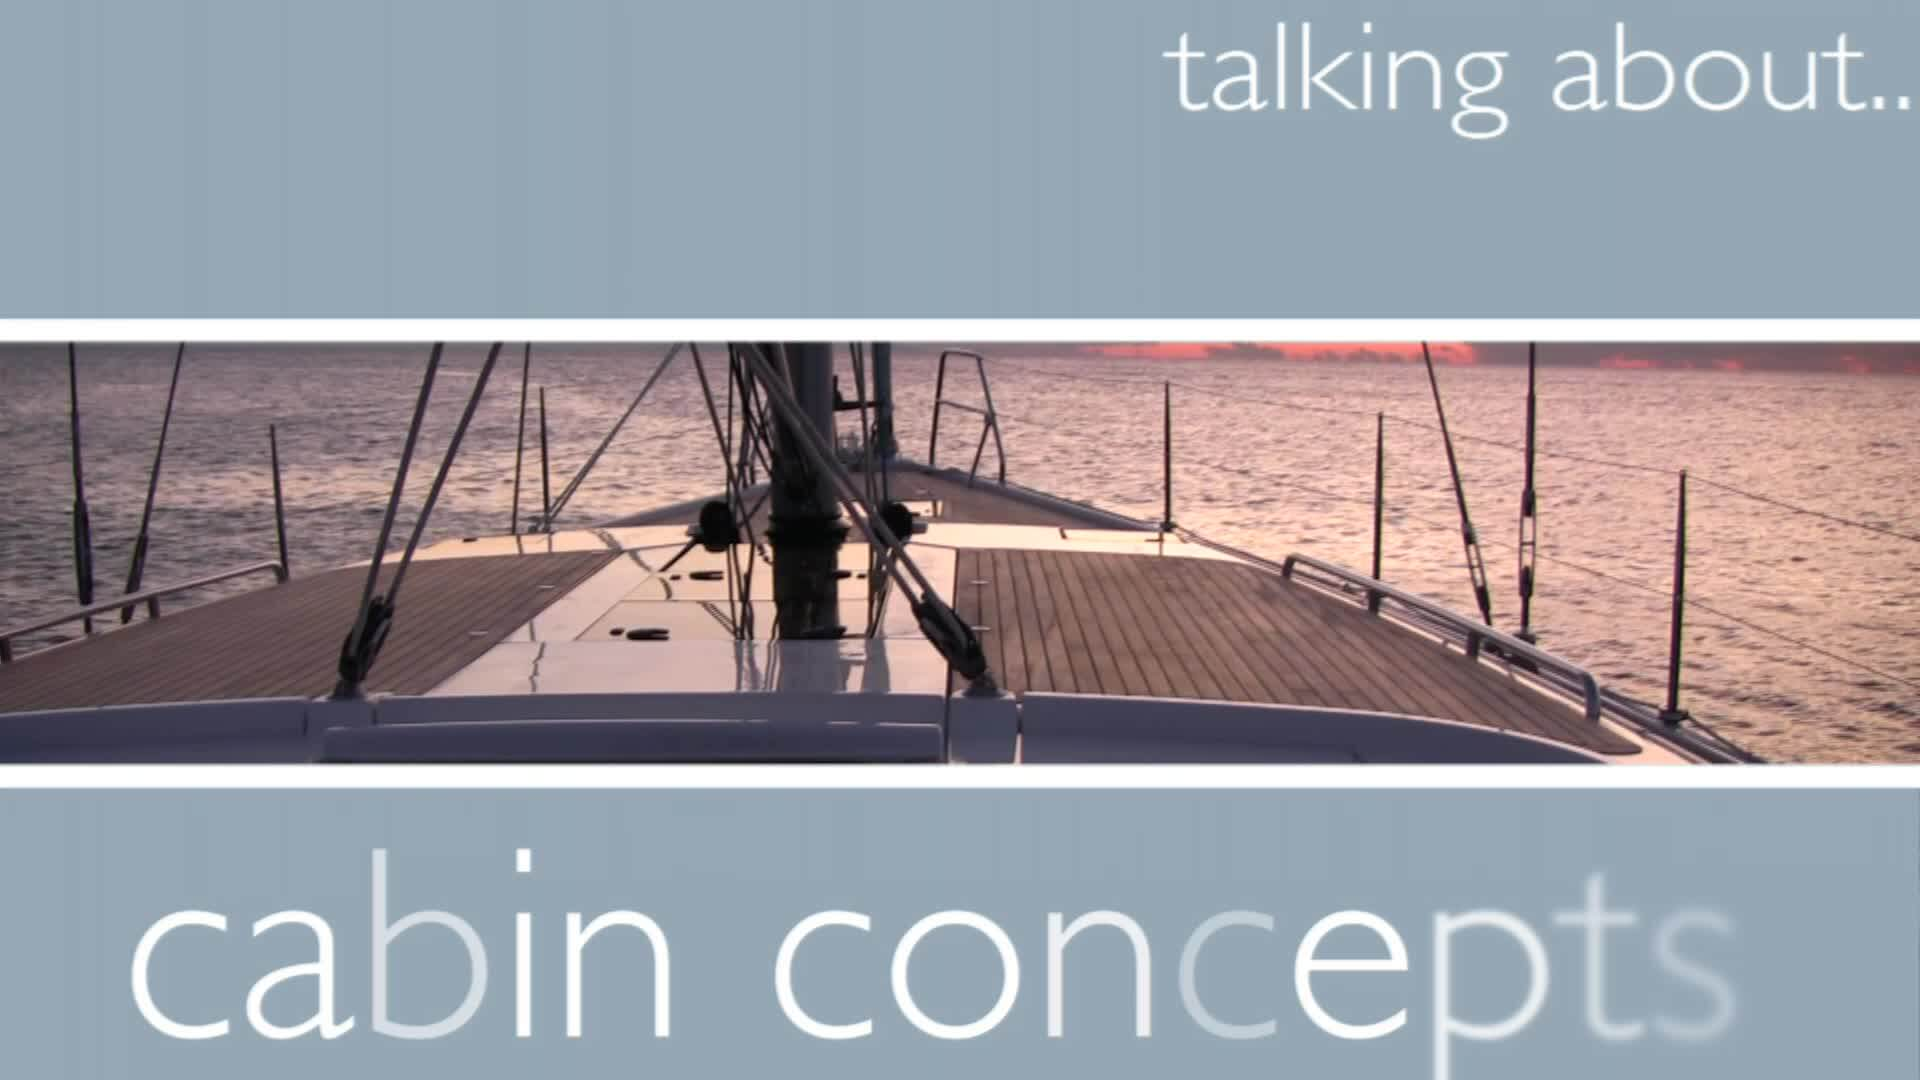 Hanse 545 Individual Cabin Concept